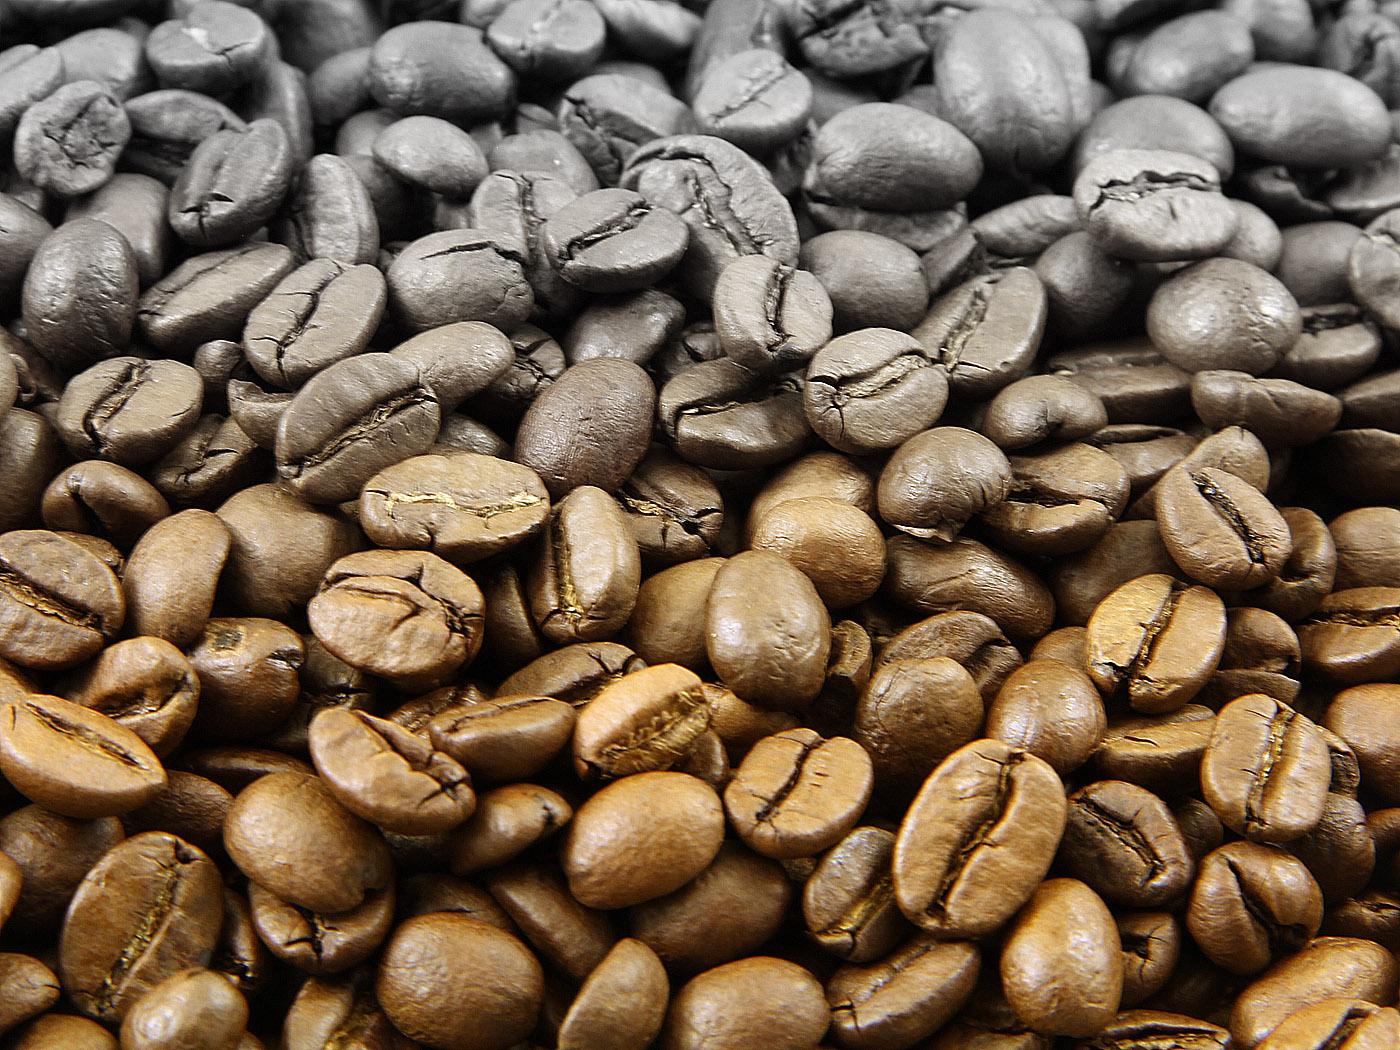 Kaffee 007 Hintergrundbild Kostenlos